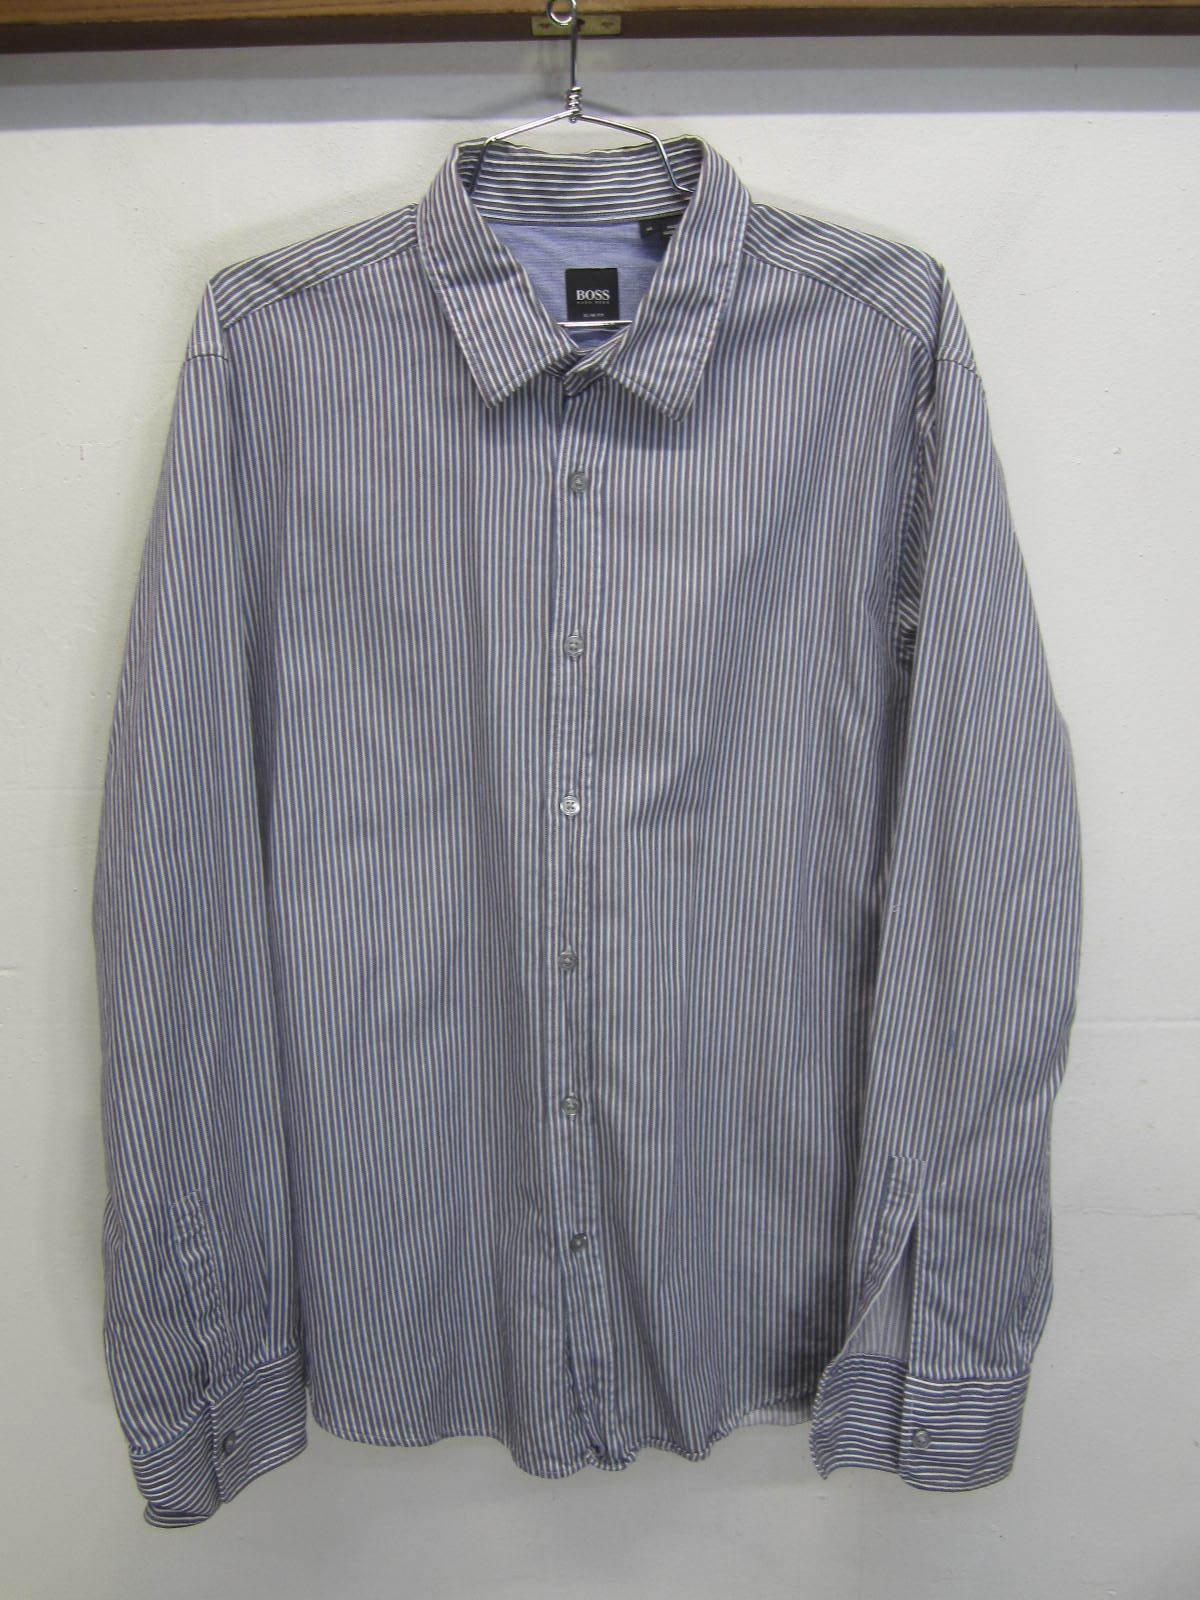 Hugo Boss Dress Shirt Slim Fit purple striped 100% cotton sz XL